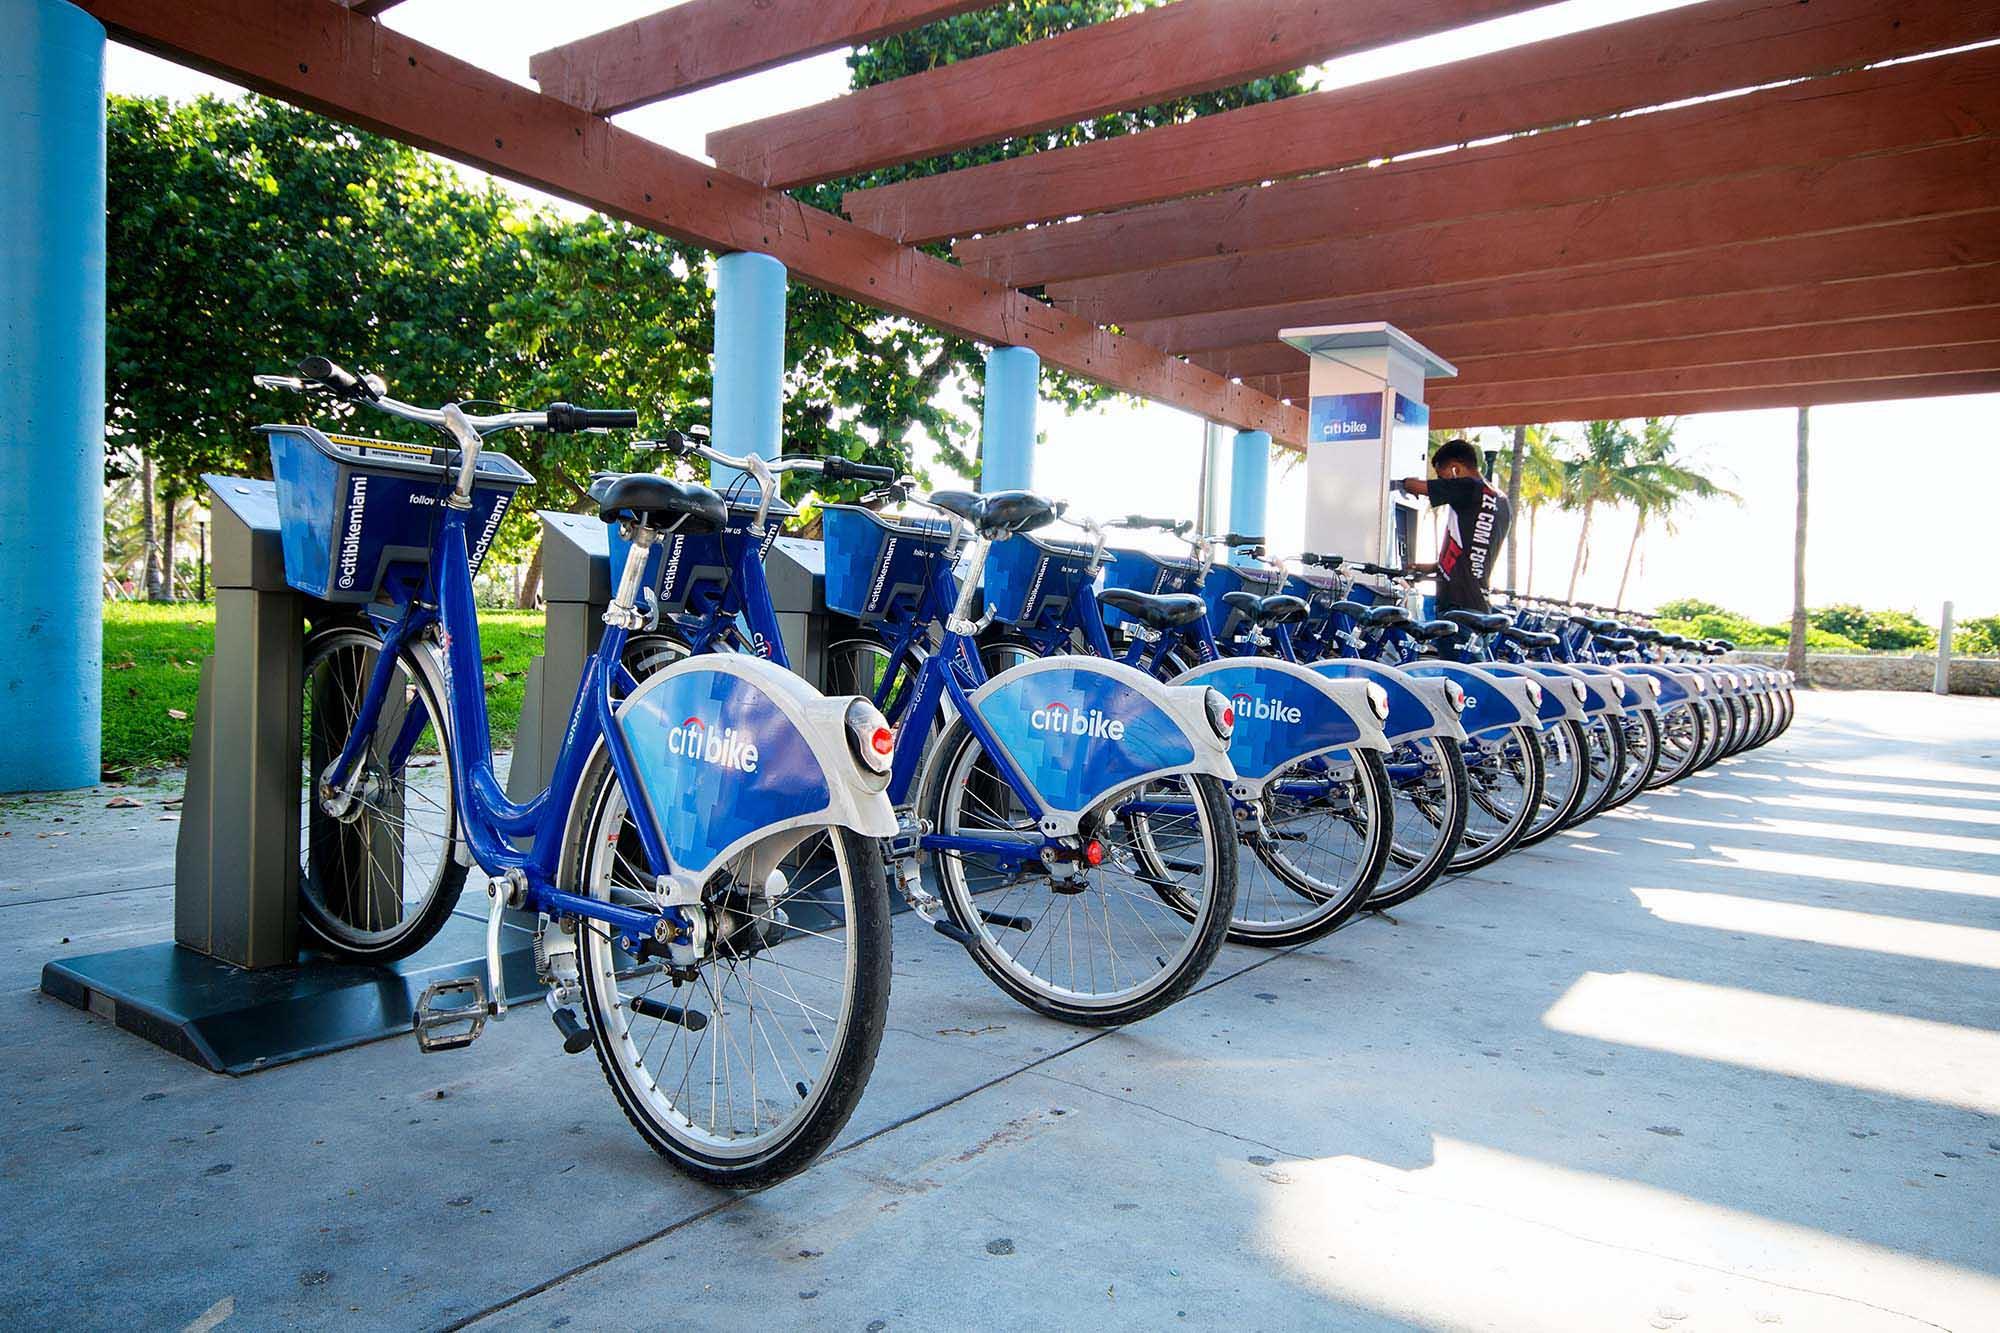 Citi Bike ENJOY MIAMI BEACH